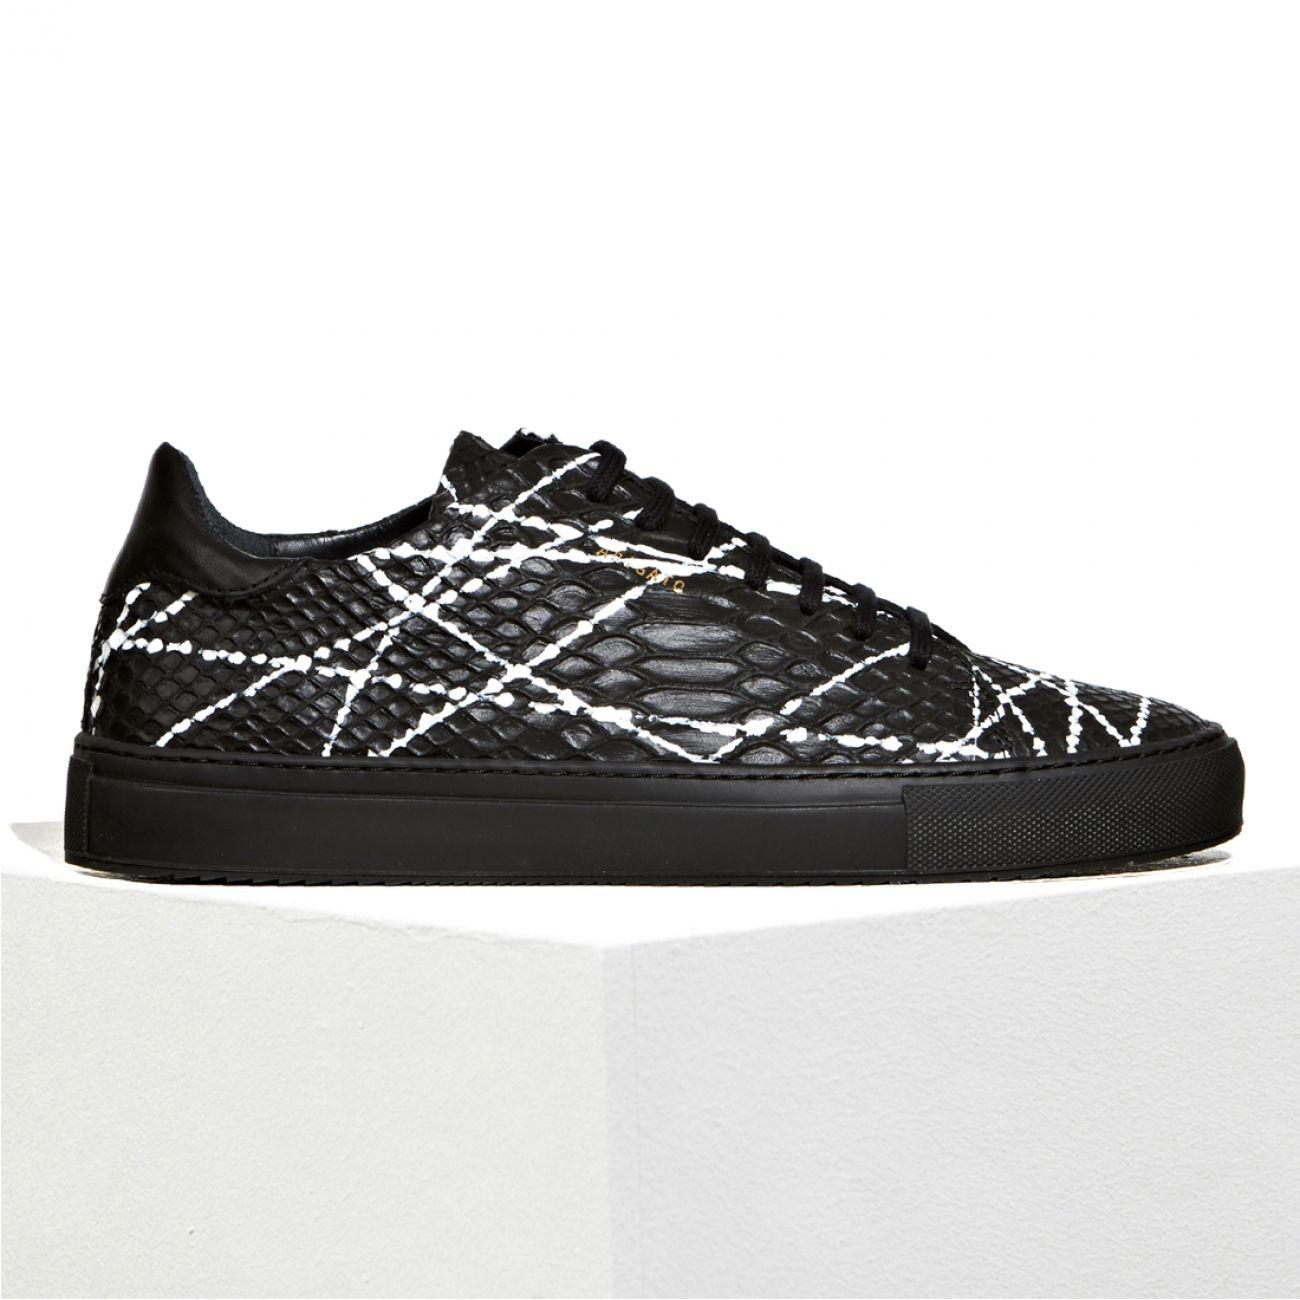 448c1ca61fb1 AXEL ARIGATO Clean 90 sneaker